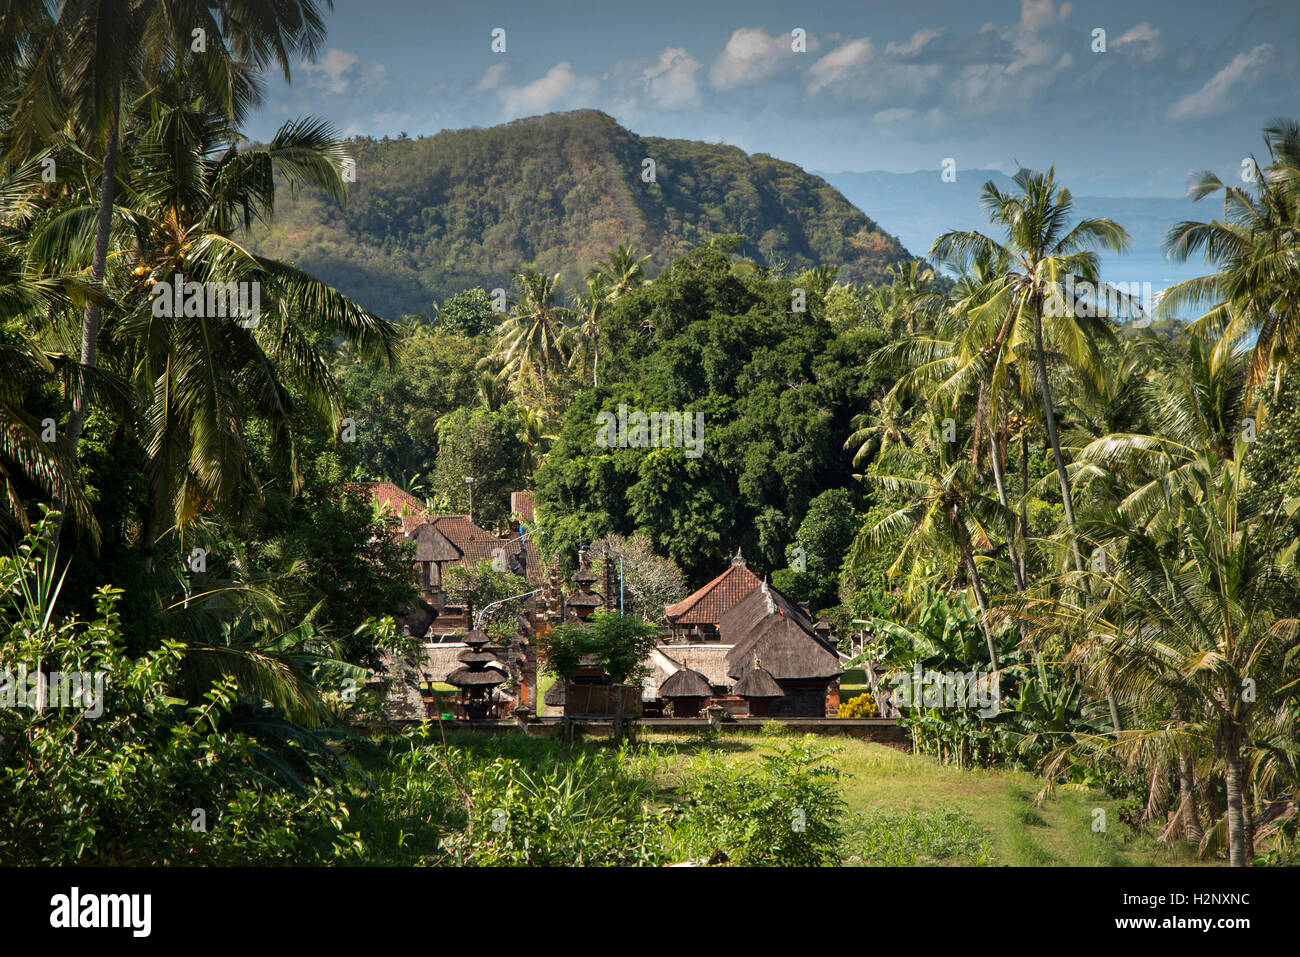 Indonesien, Bali, Manggis, erhöhten Blick auf Hügel Tempel von Bukit Telengan Stockbild